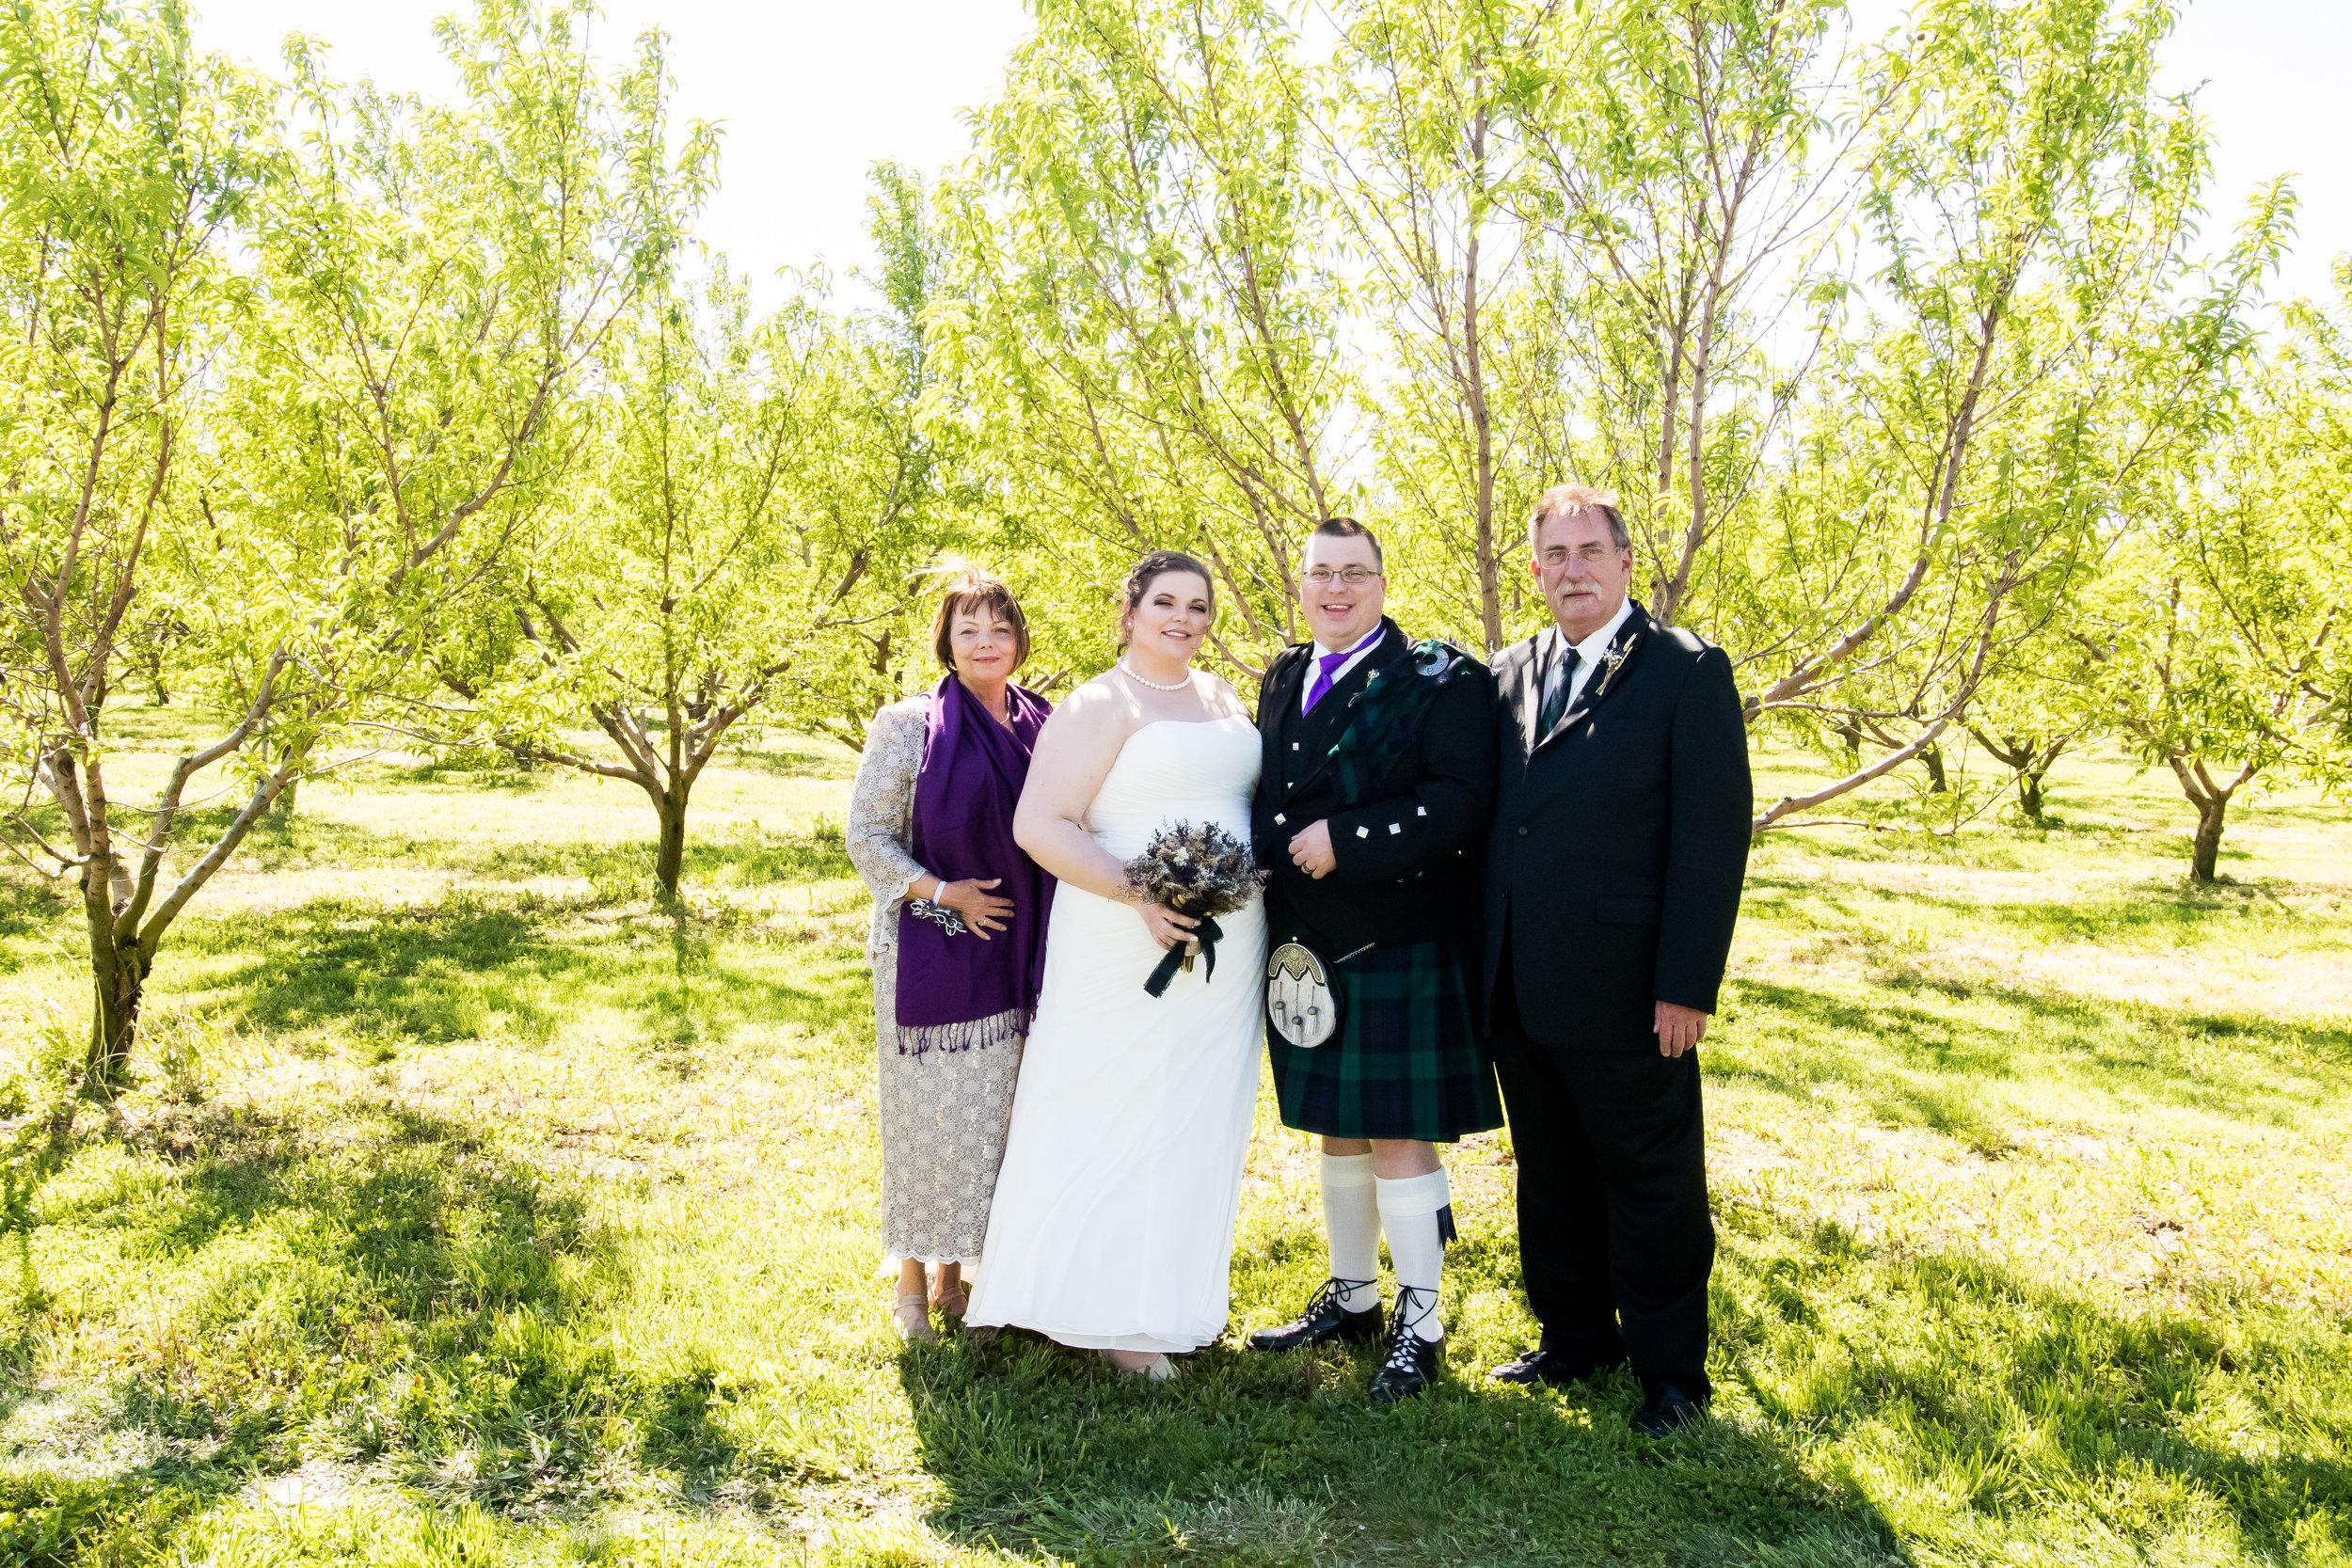 Indiana_Wedding_Photography_Zacharaiah-571.jpg